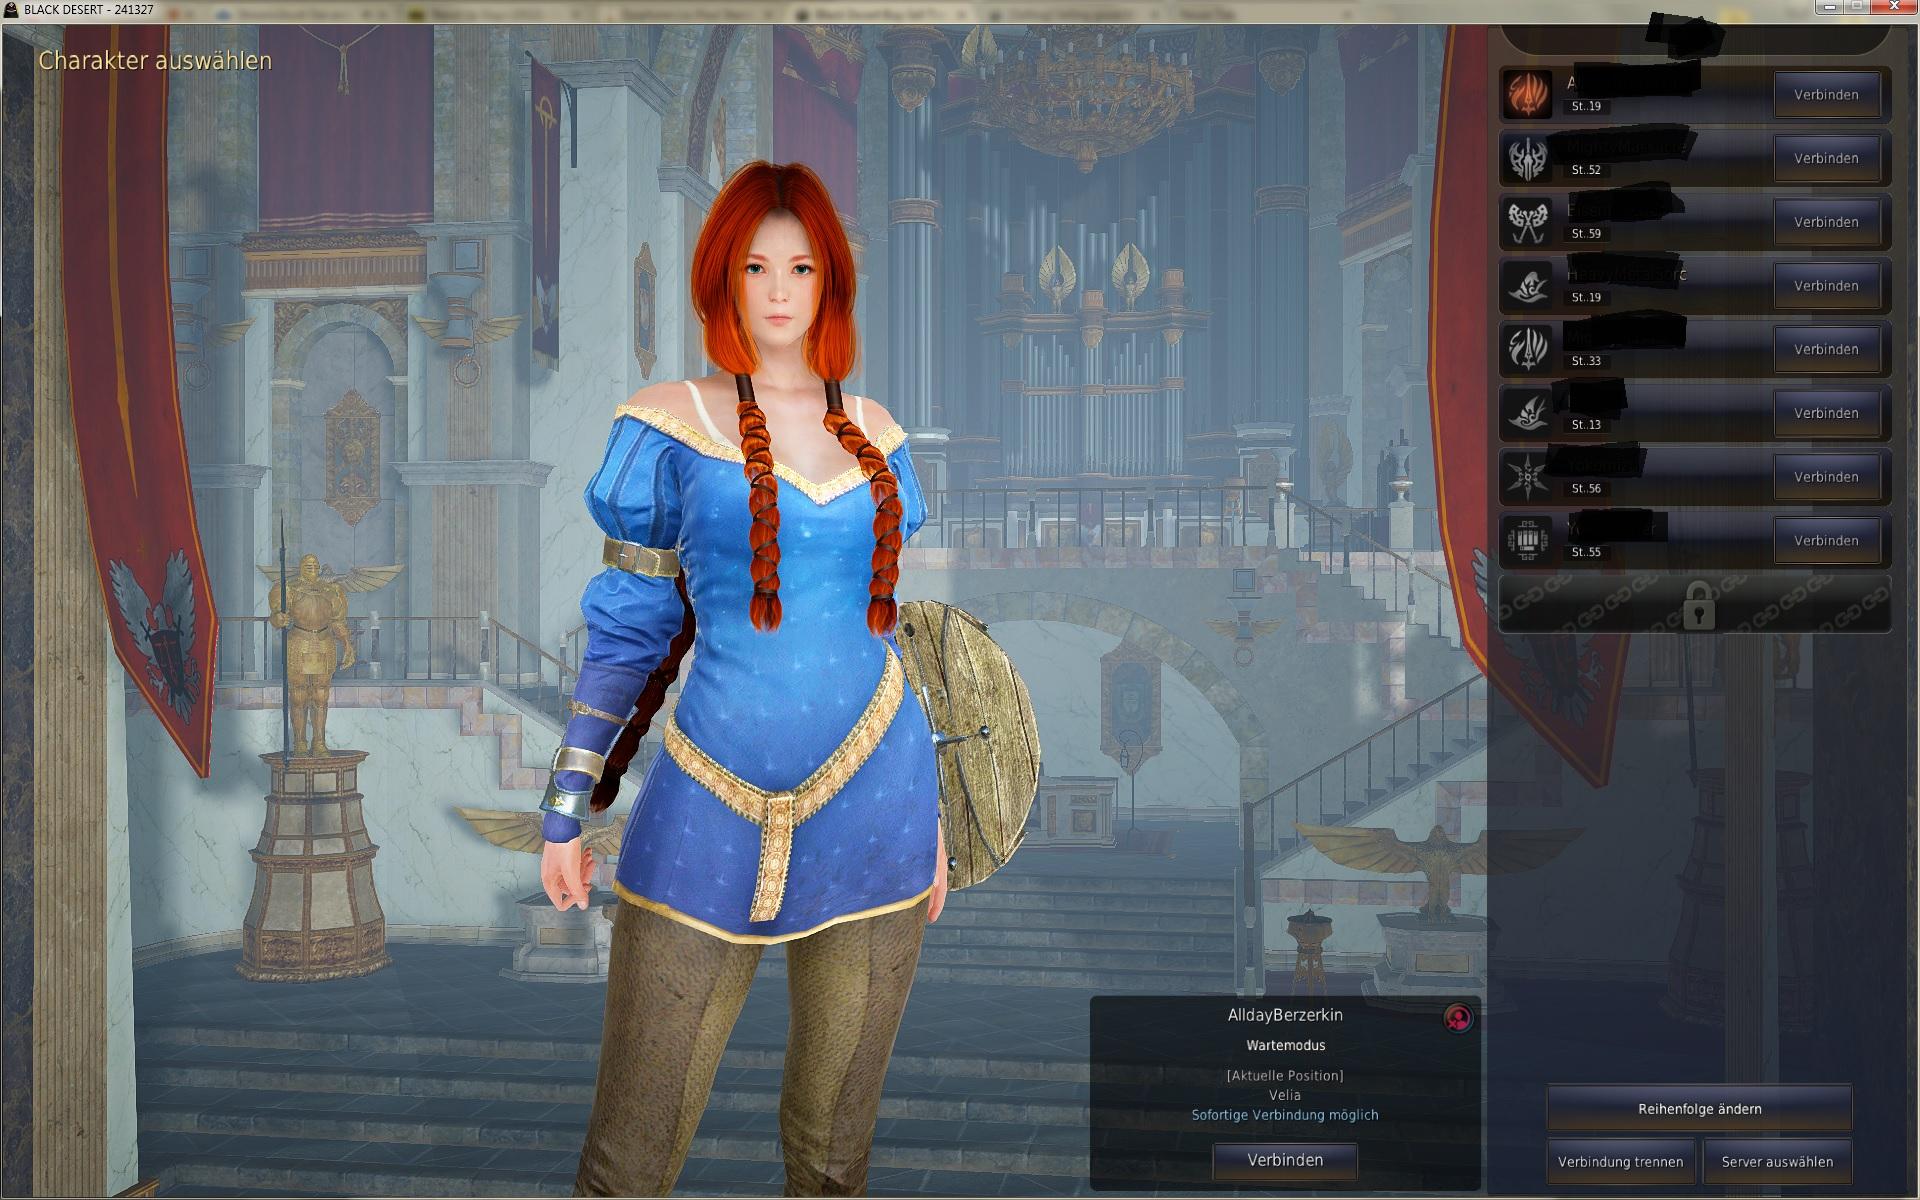 Black desert online ninja garvey regan bdo fashion - Screenshots Bdo Acc Jpgbdo